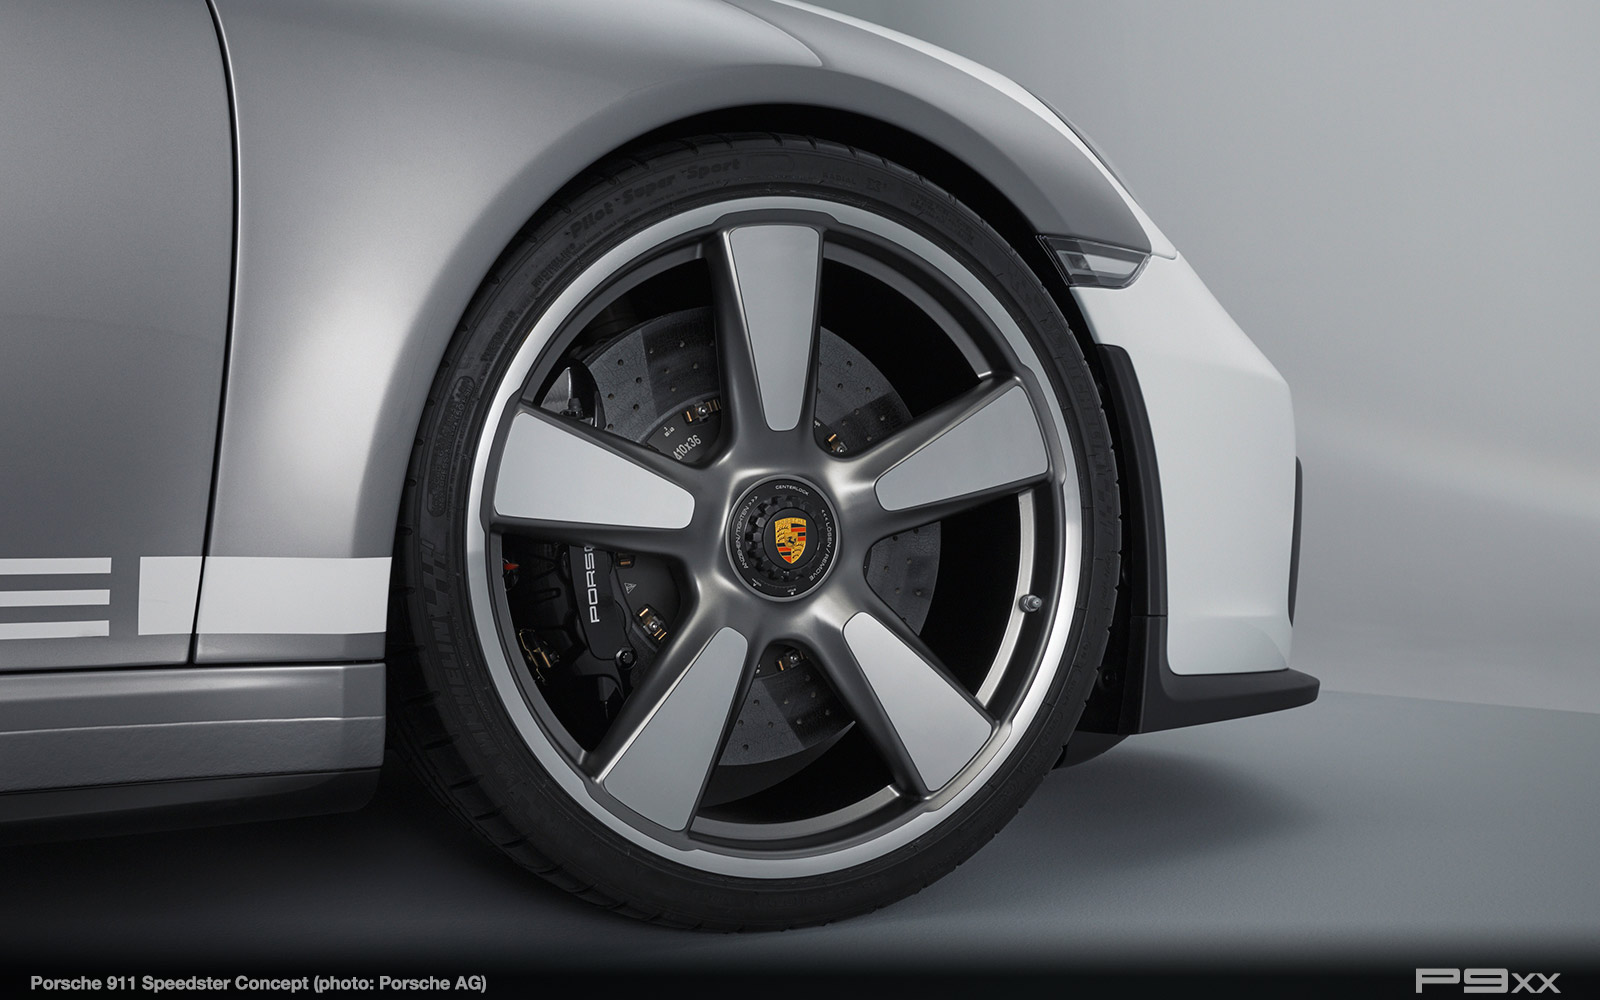 Porsche-911-Speedster-Concept-2018-312